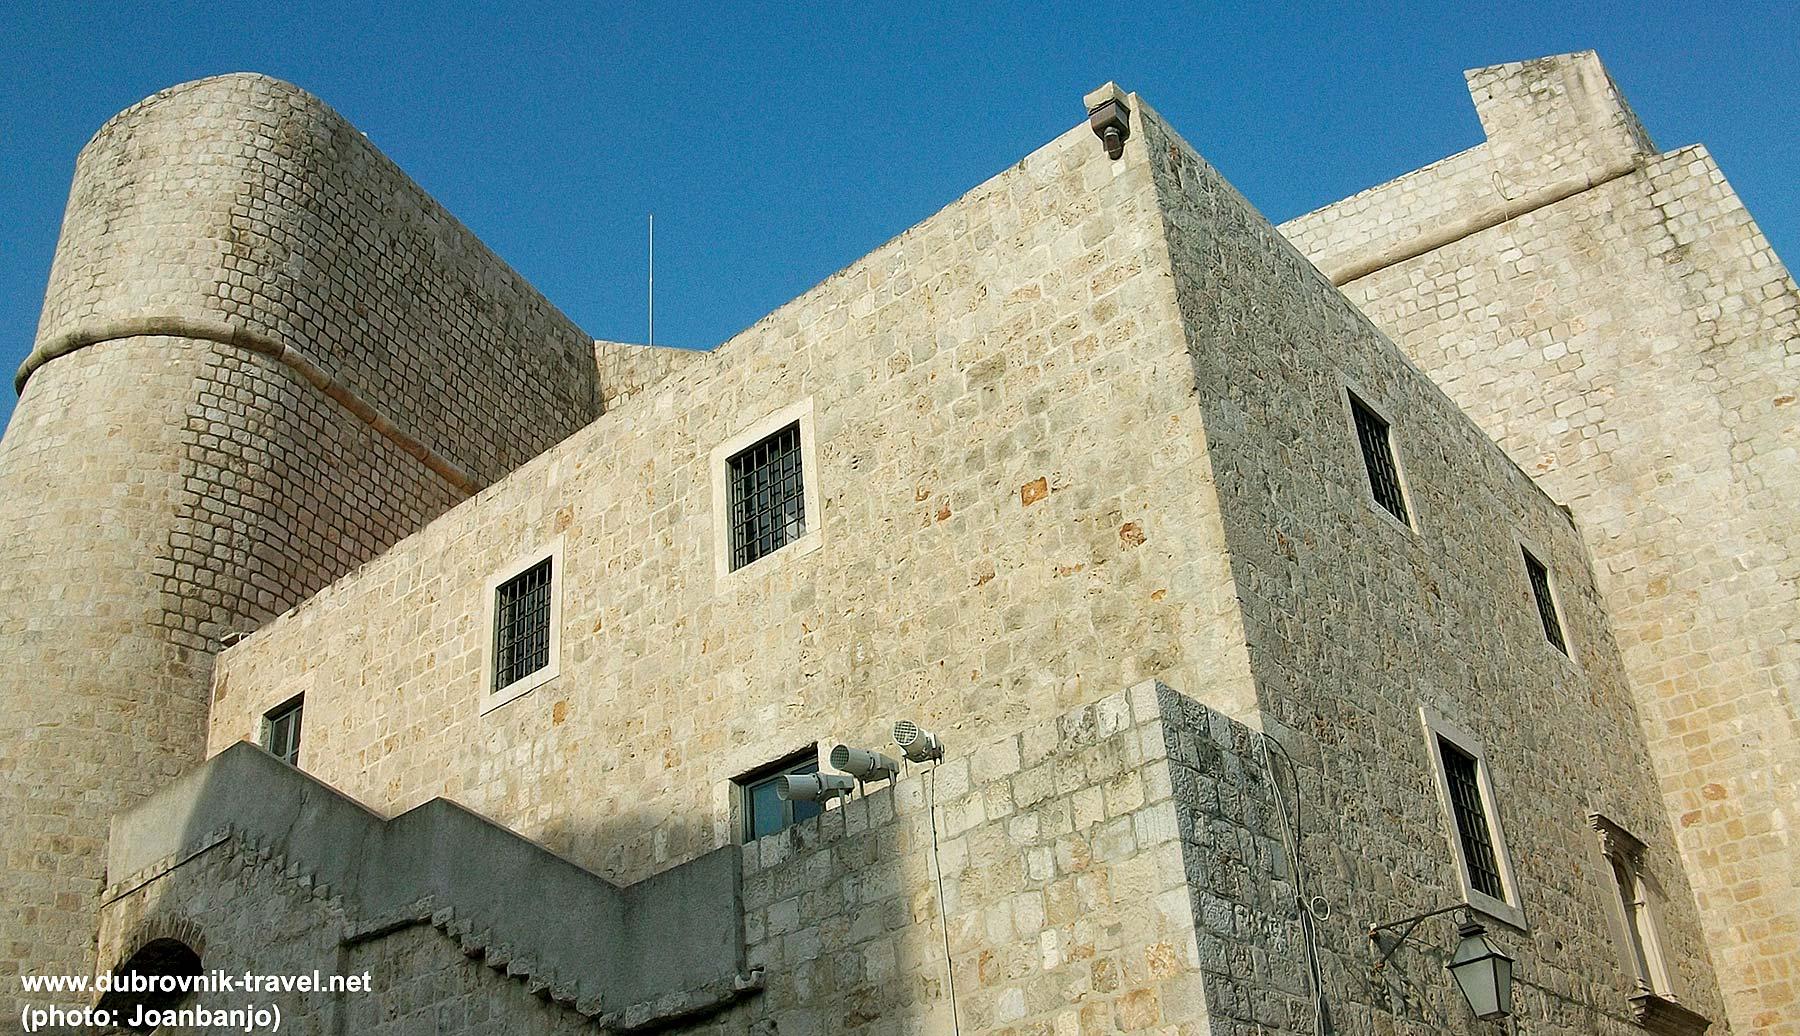 Detail of Fortress Revelin in Dubrovnik